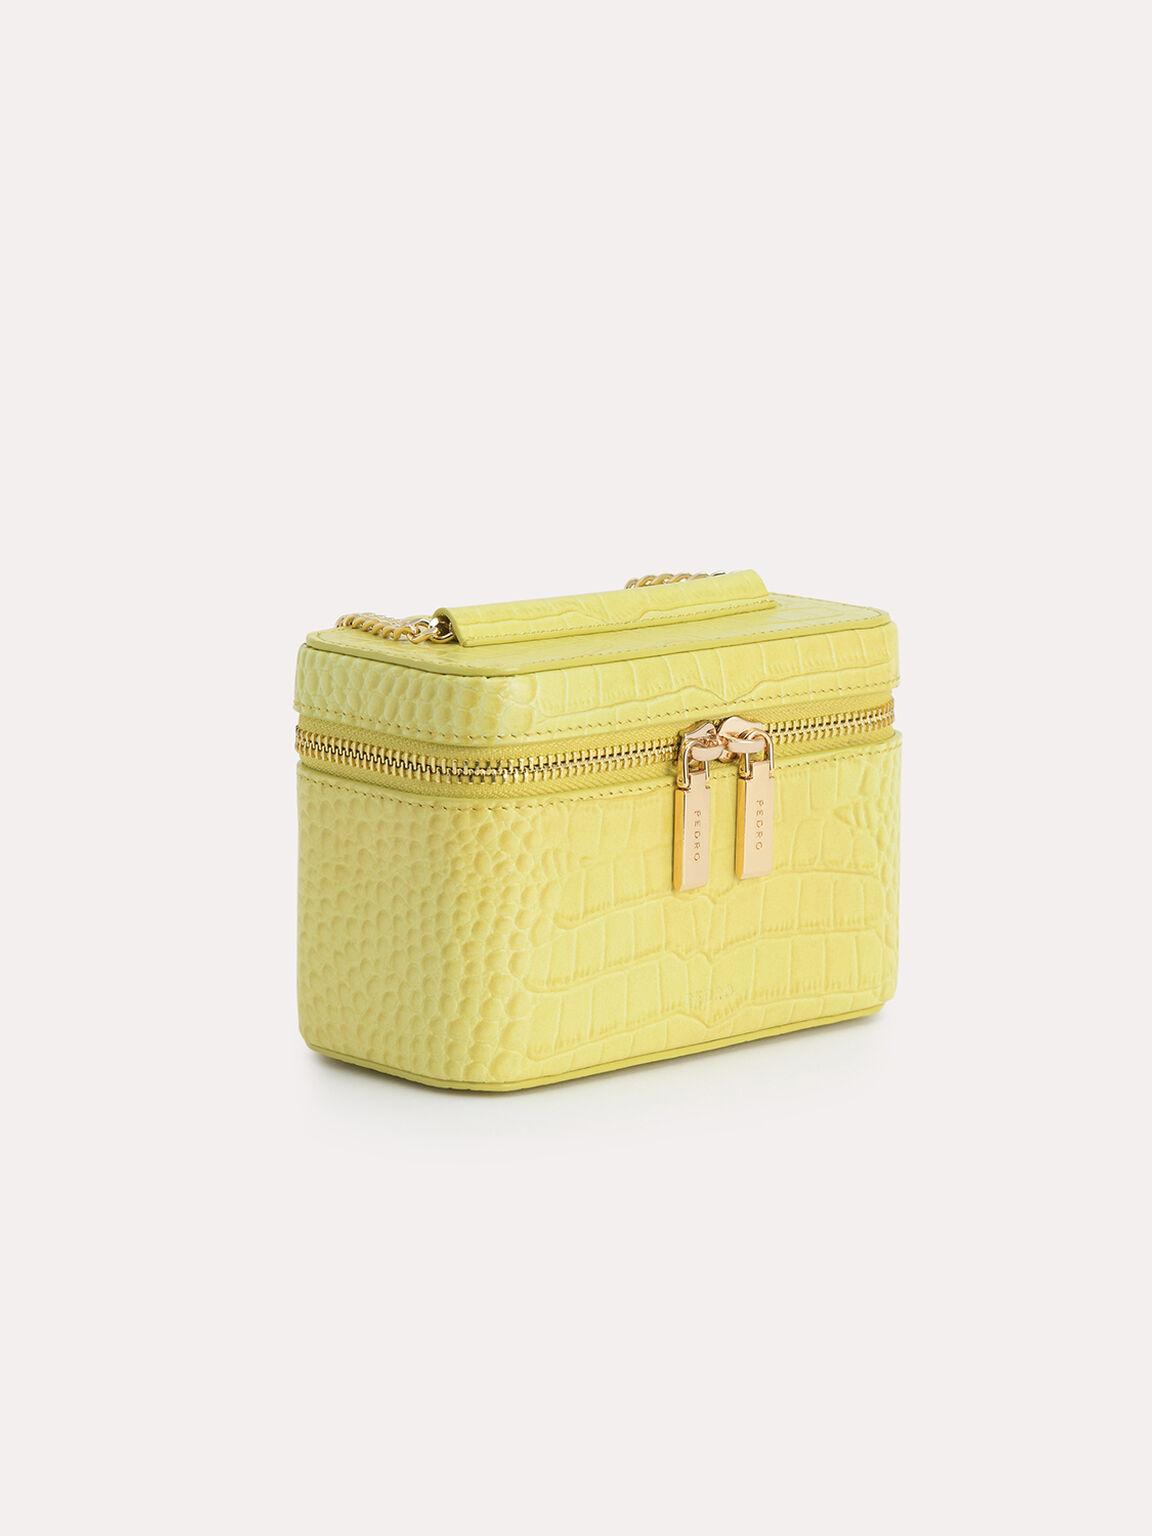 Textured Leather Vanity Case, Yellow, hi-res